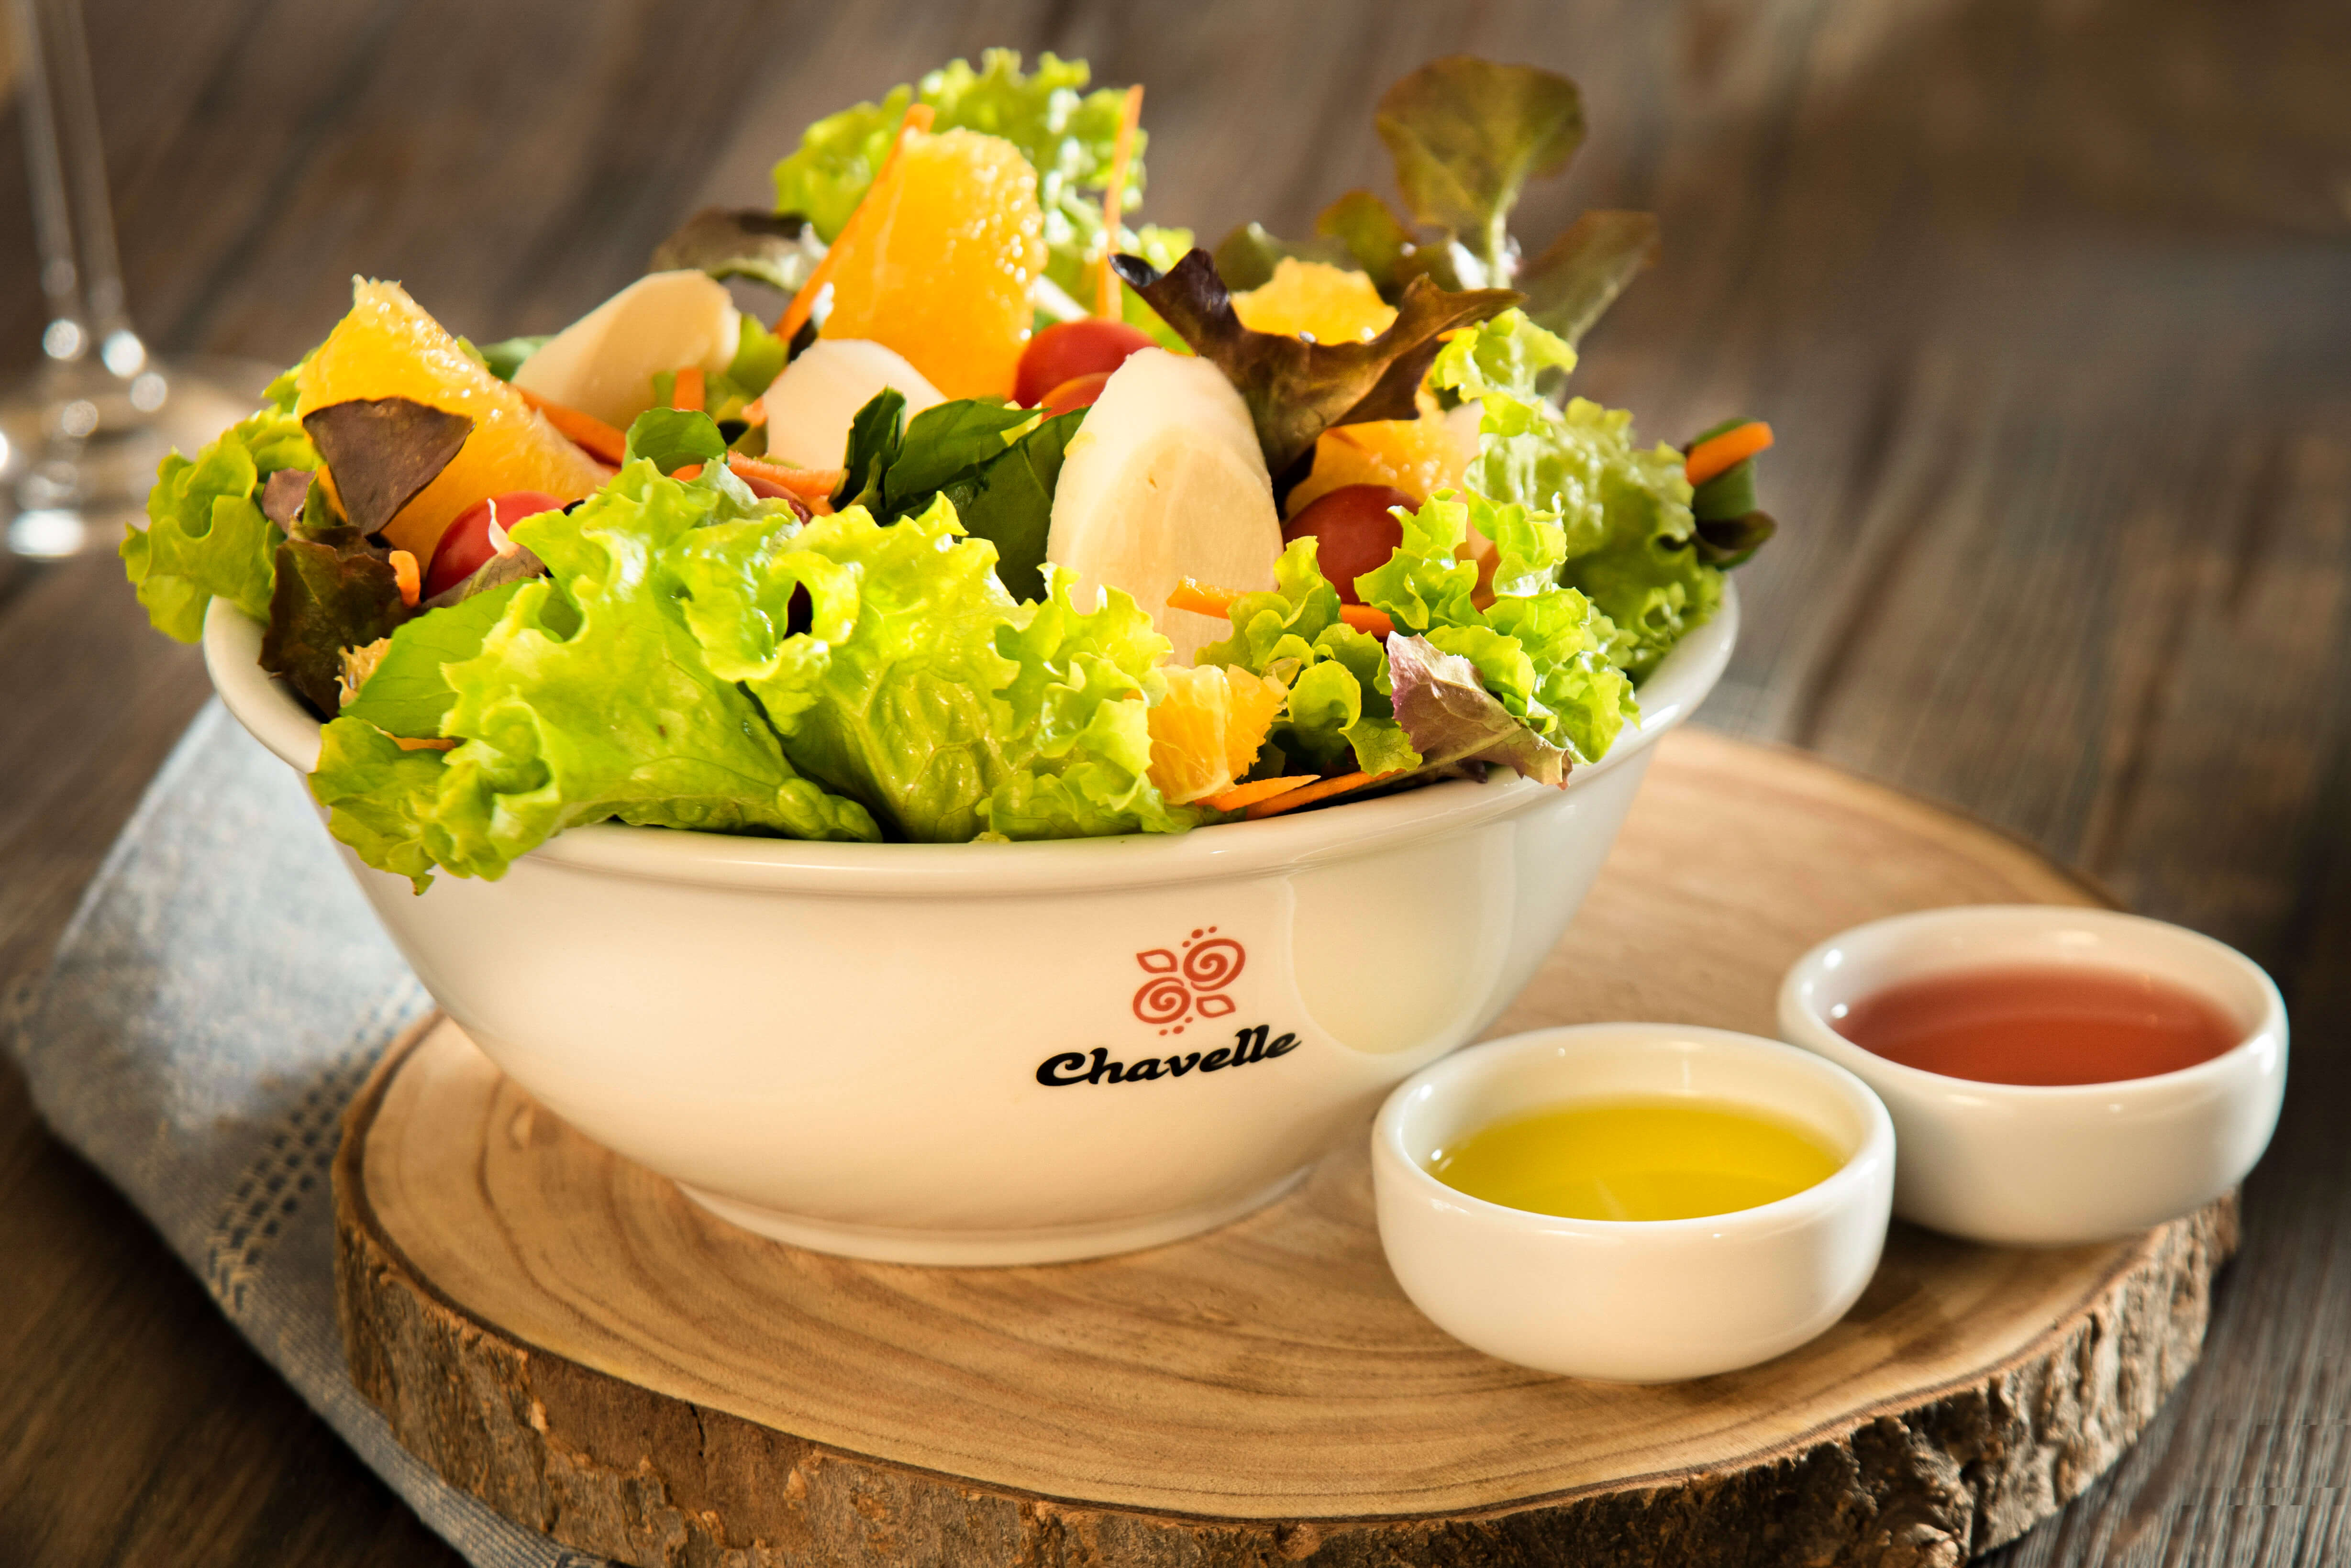 Salada Chavelle